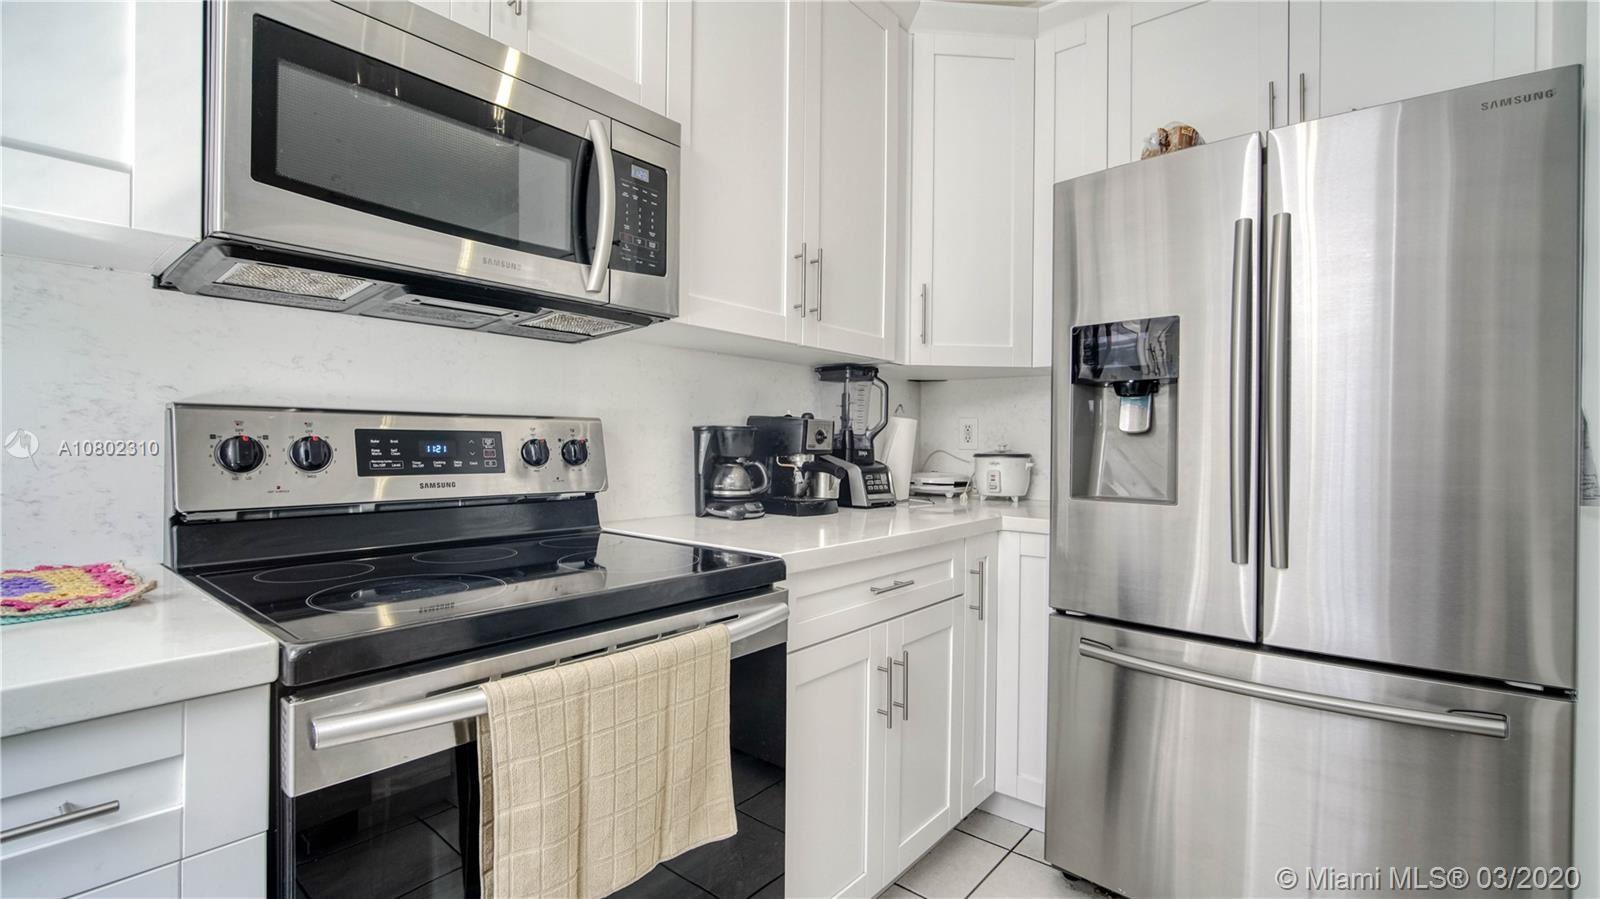 11476 NW 43rd Terrace #11476, Doral, FL 33178 - MLS#: A10802310